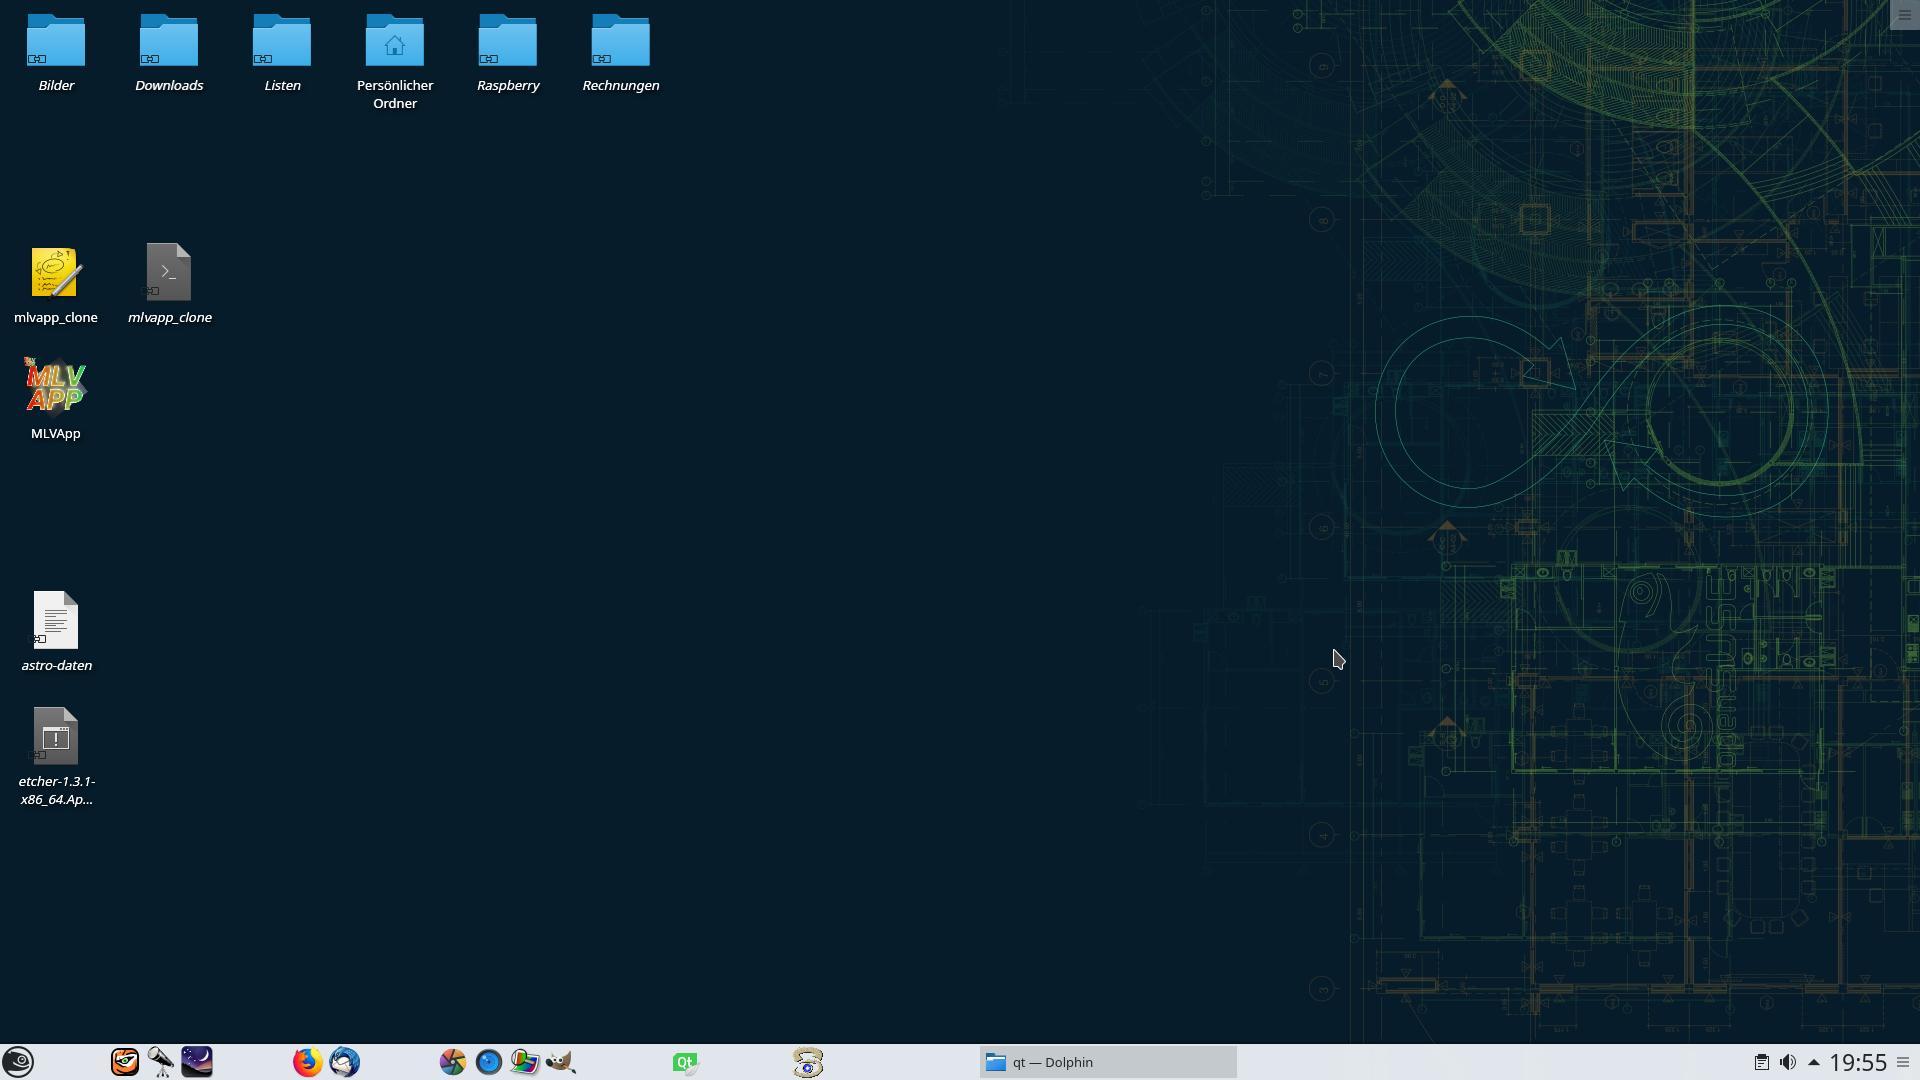 mlvapp-desktop